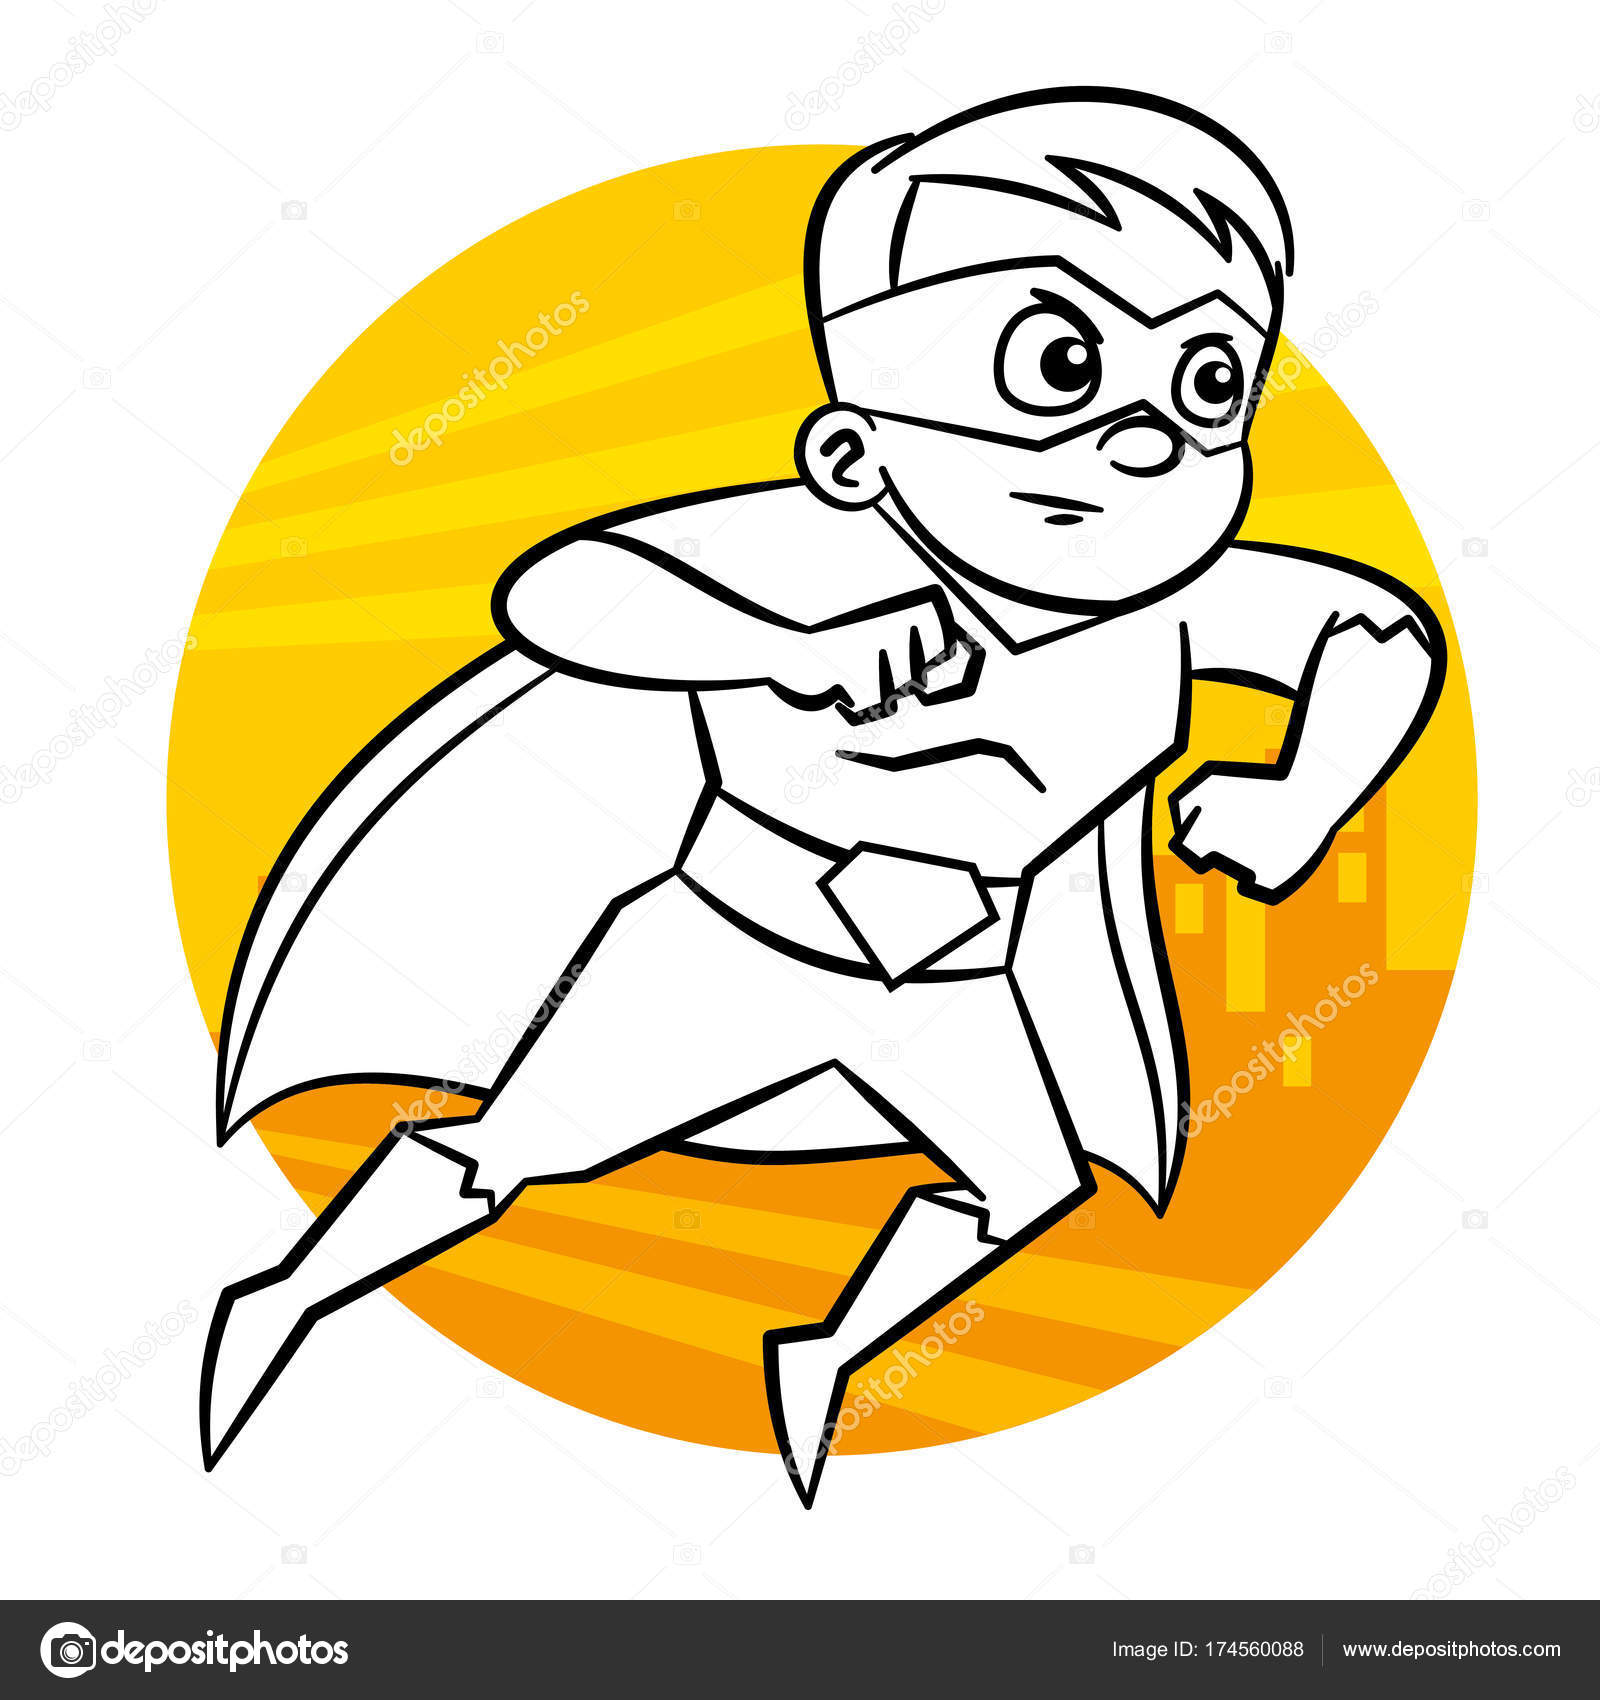 Malvorlagen Superhelden — Stockvektor © ichbinsam #174560088